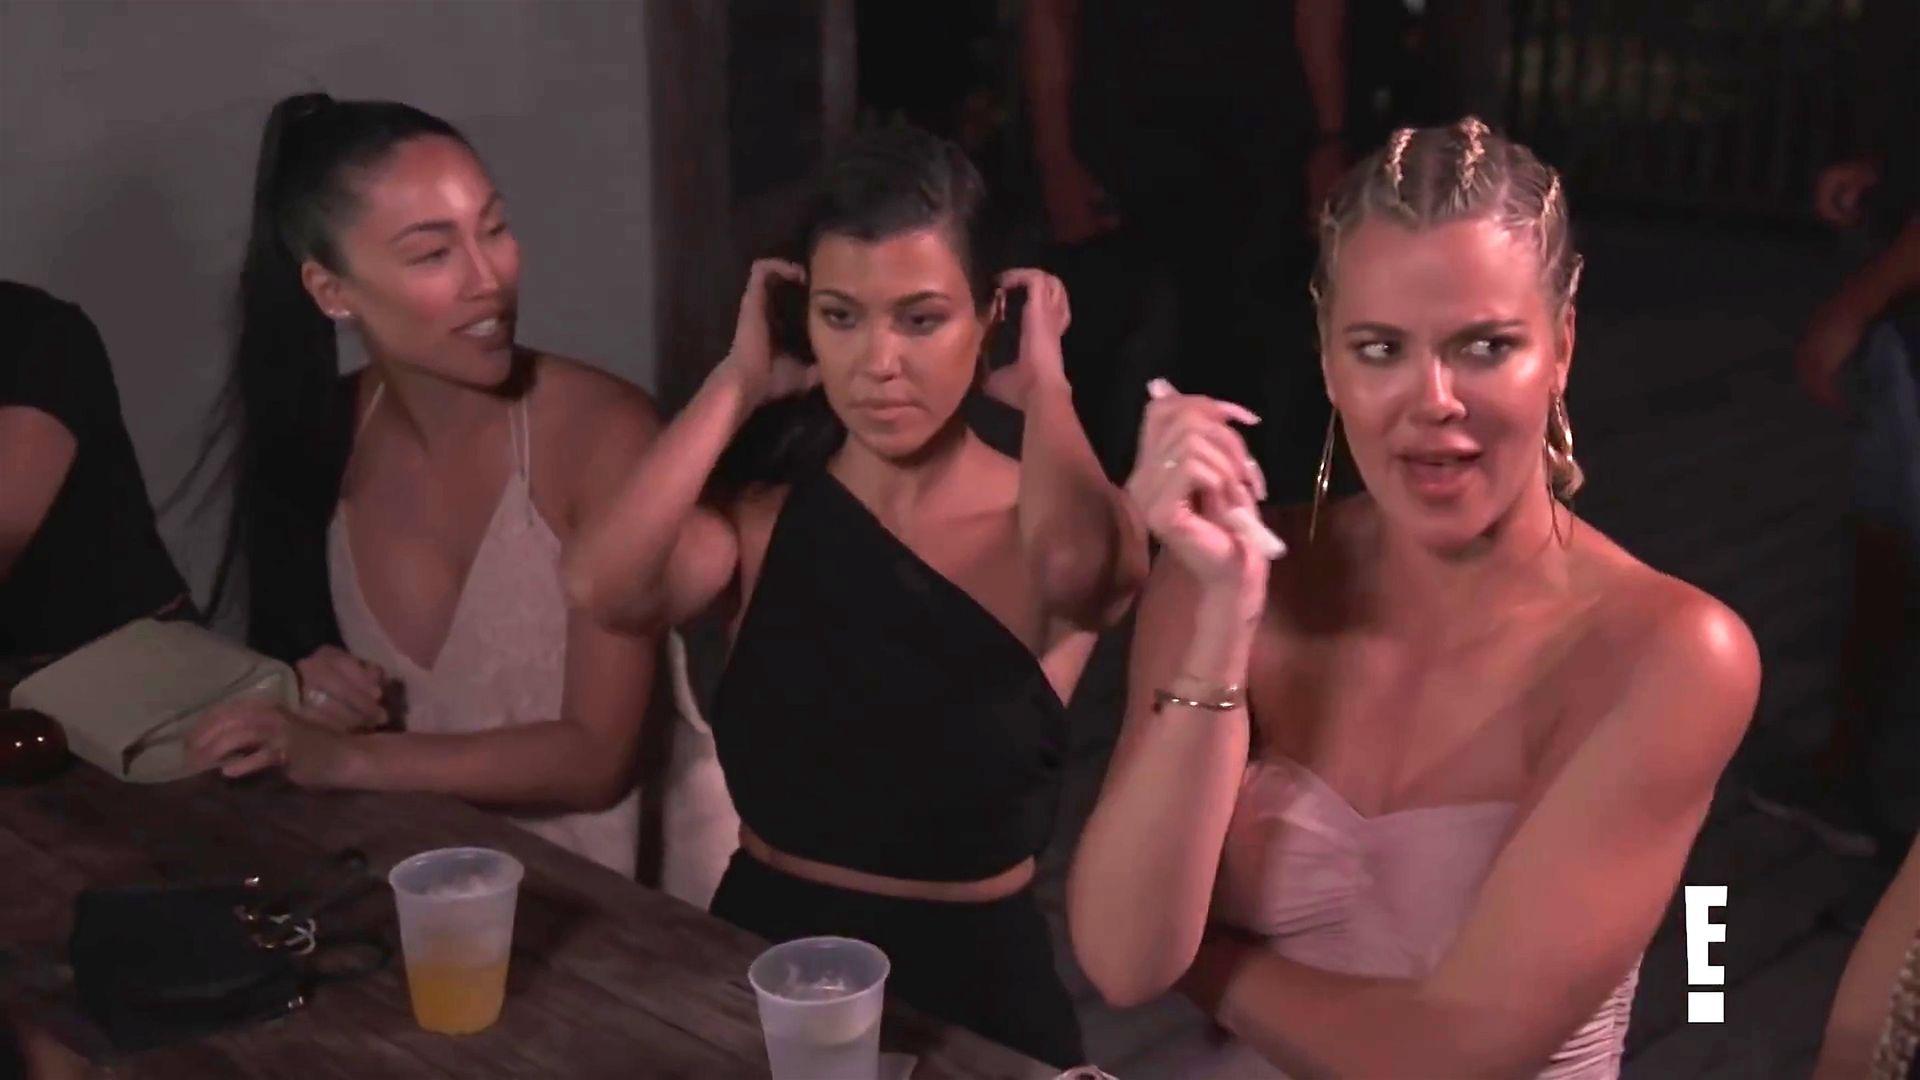 Khloé Kardashian Gets A Little Cold Without A Bra 0008